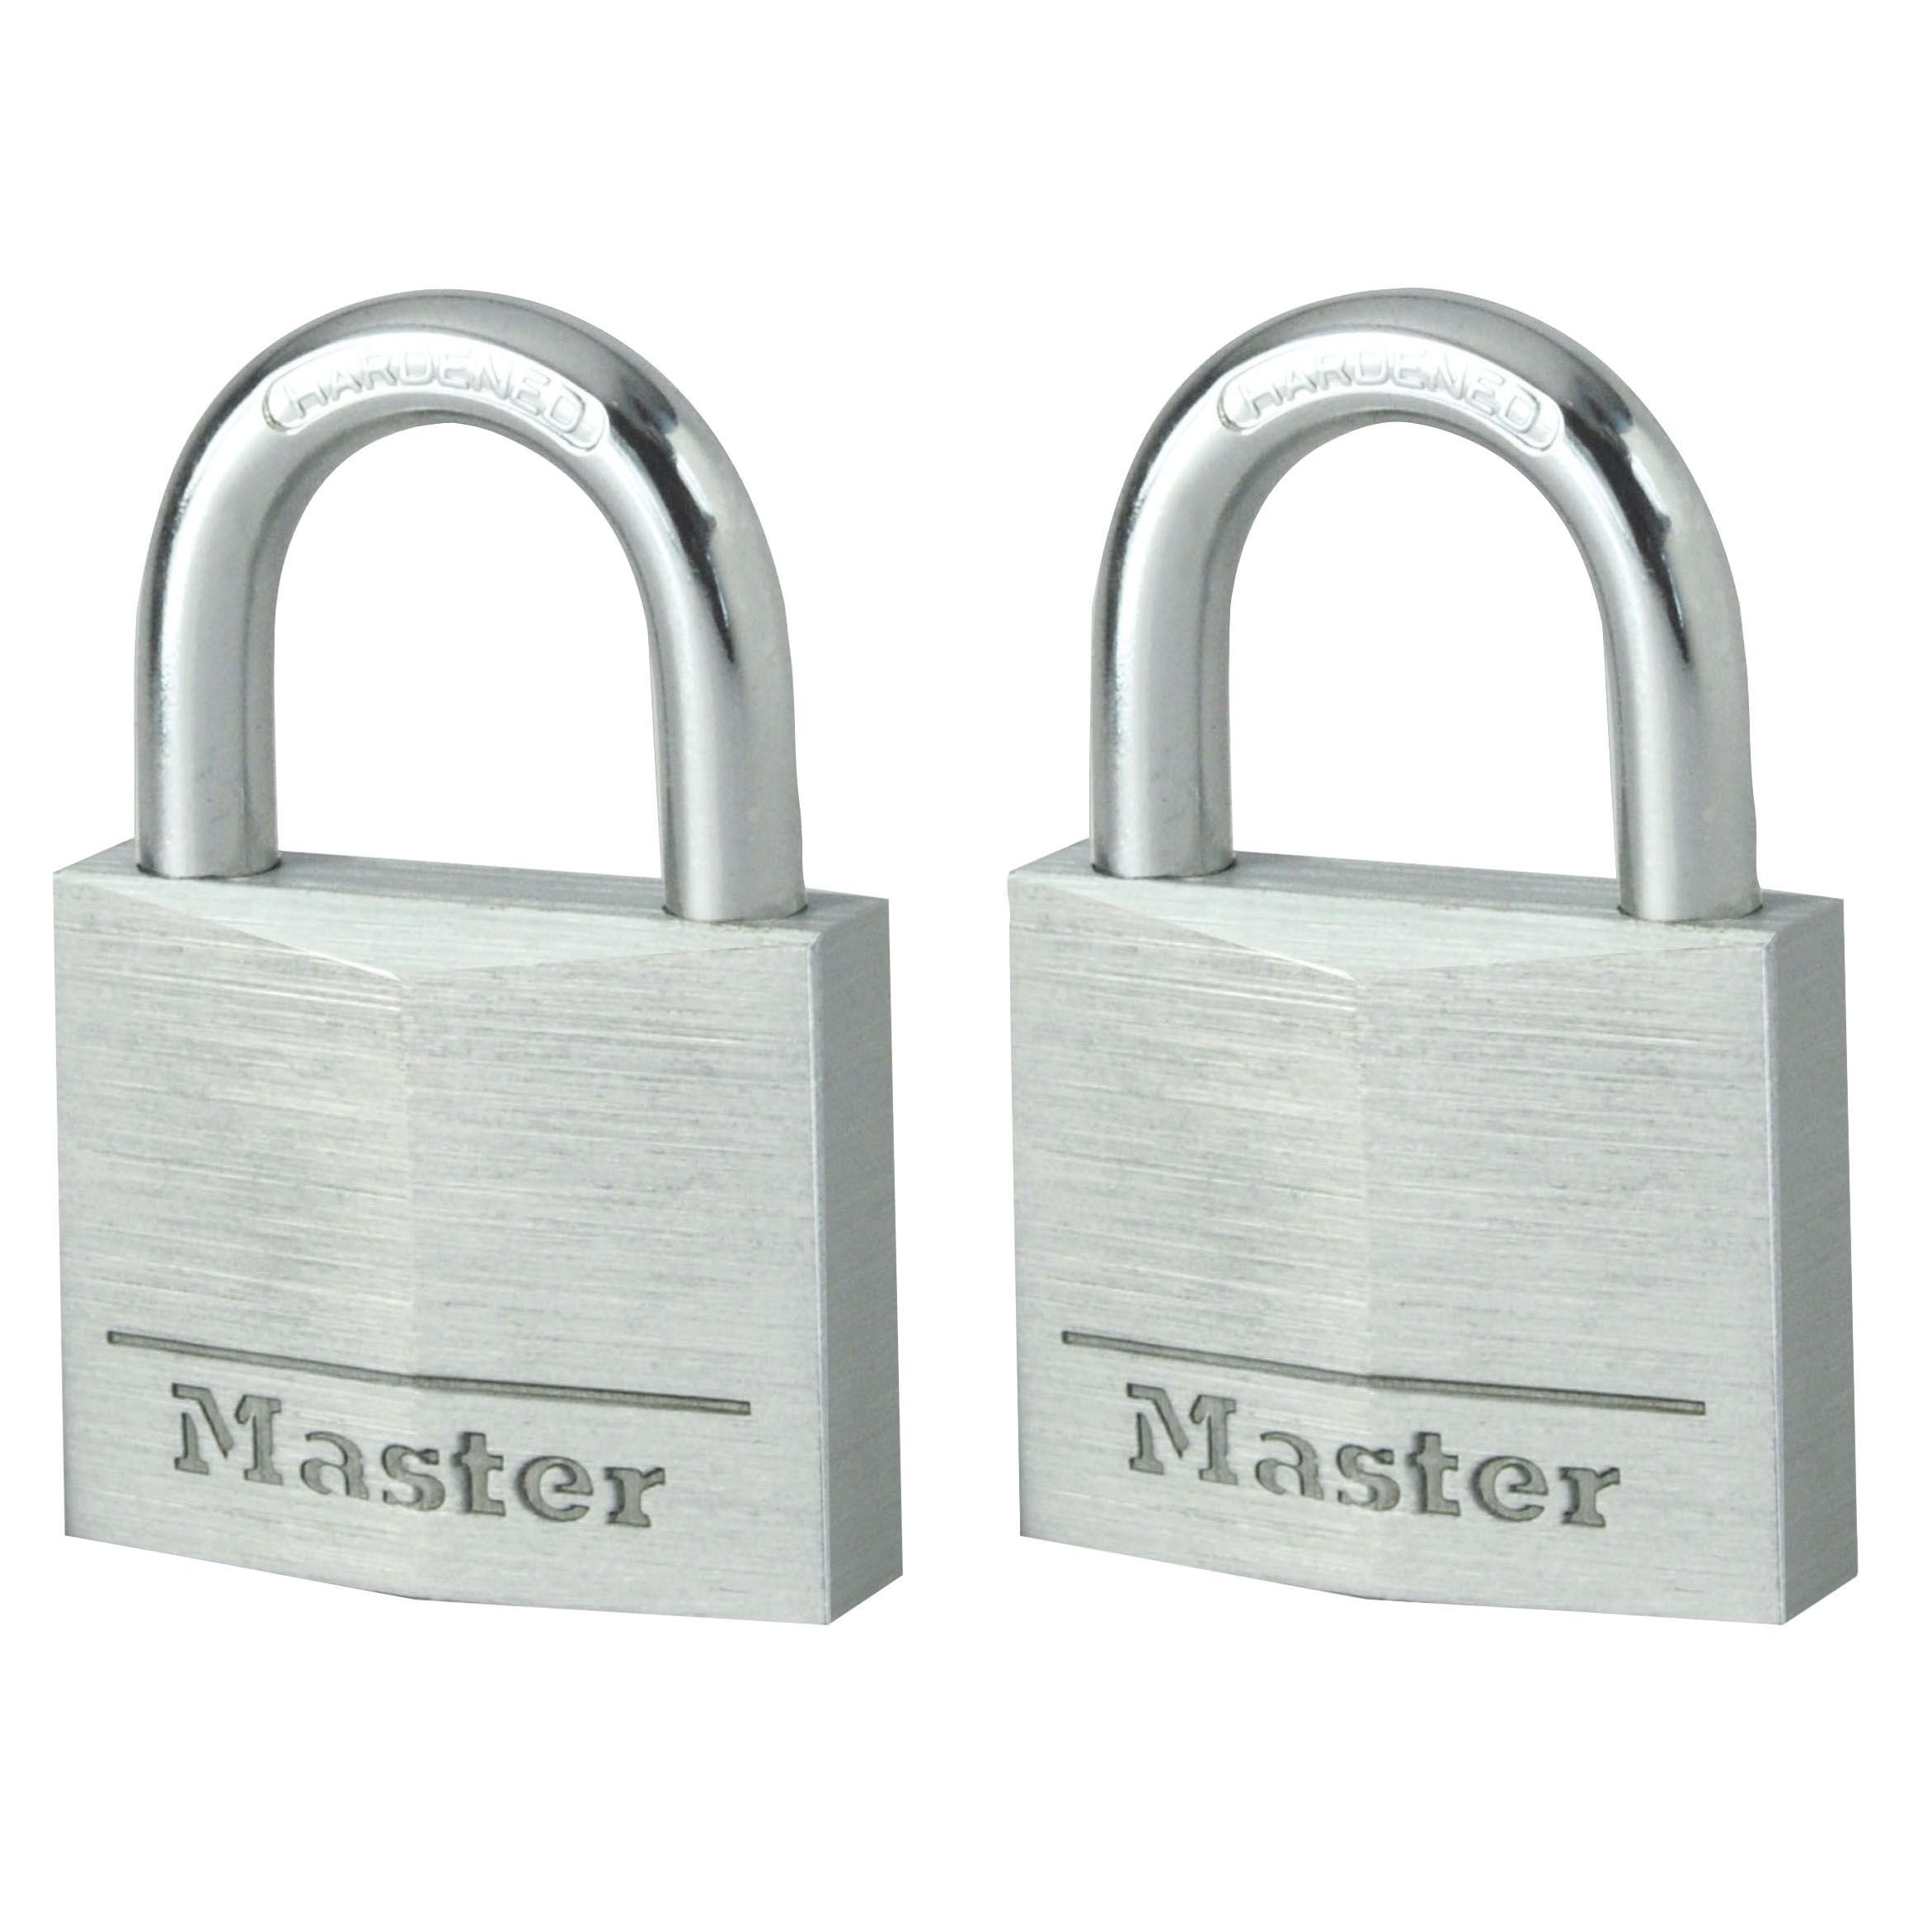 Master Lock Steel 3-pin Tumbler Open Shackle Padlock (w)30mm, Pack Of 2